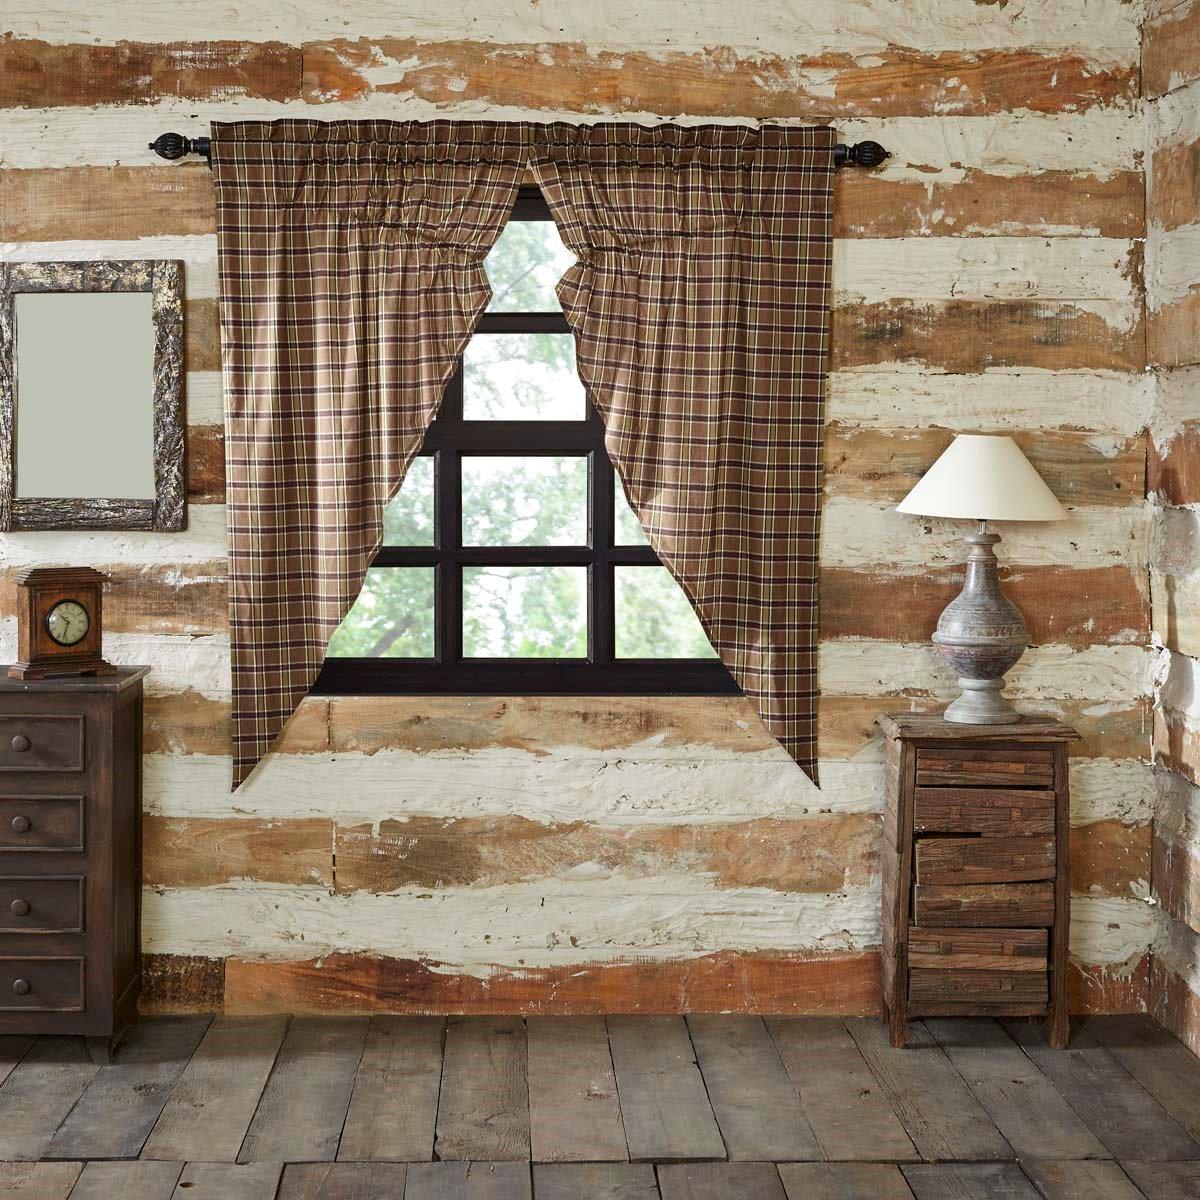 Wyatt Prairie Curtain set of 2 (63L x 36W)